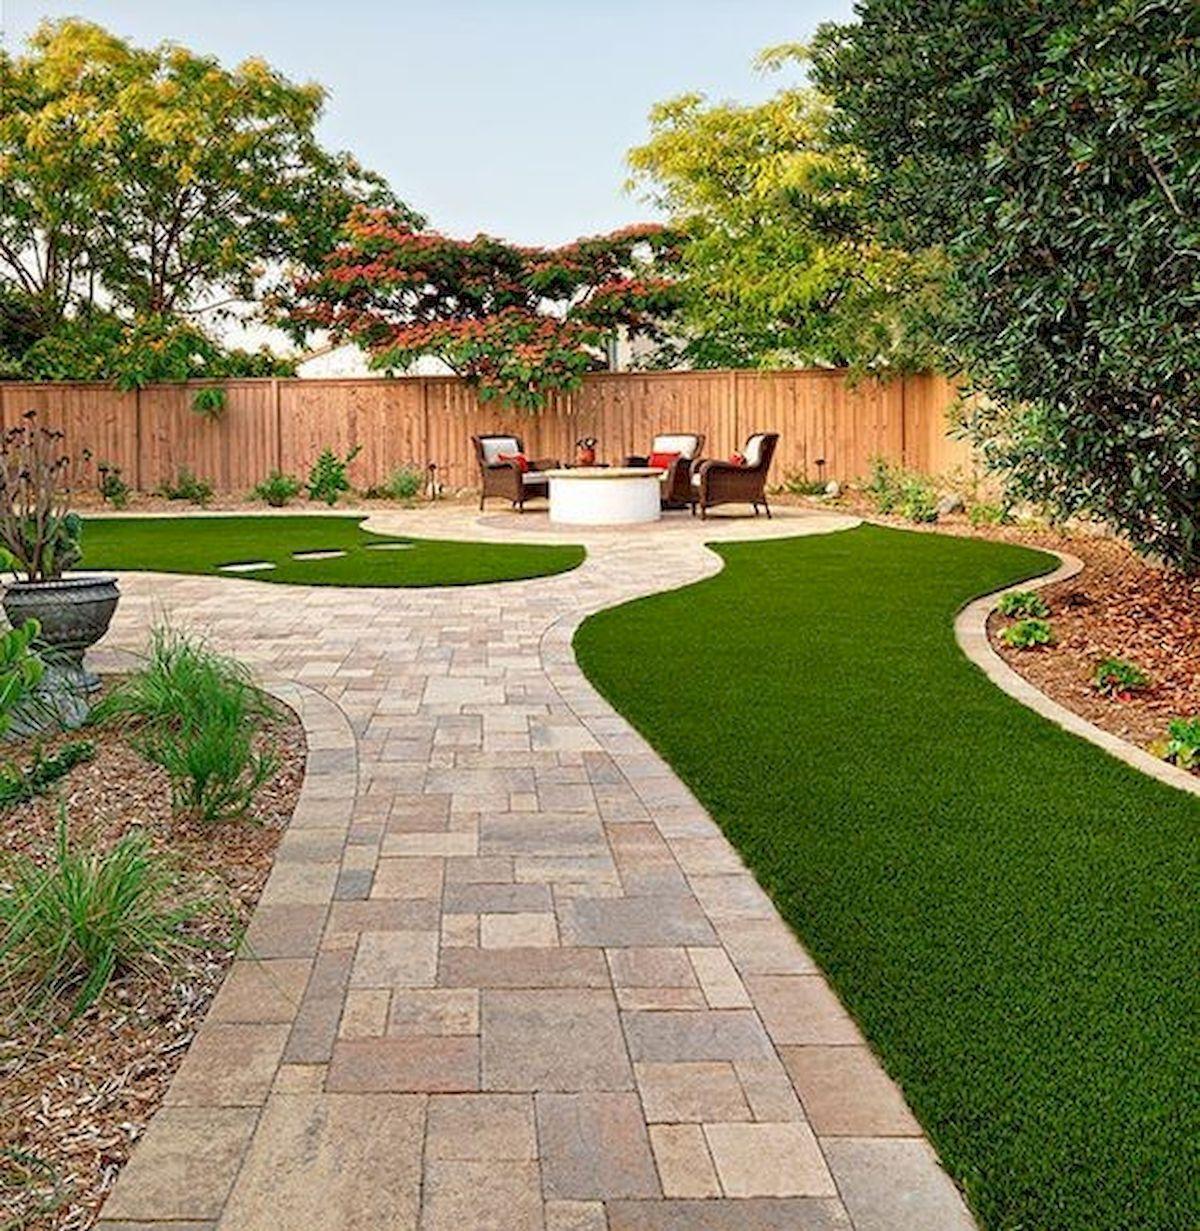 Small Garden Ideas Beautiful Renovations For Patio Or: 60 Beautiful Backyard Garden Design Ideas And Remodel